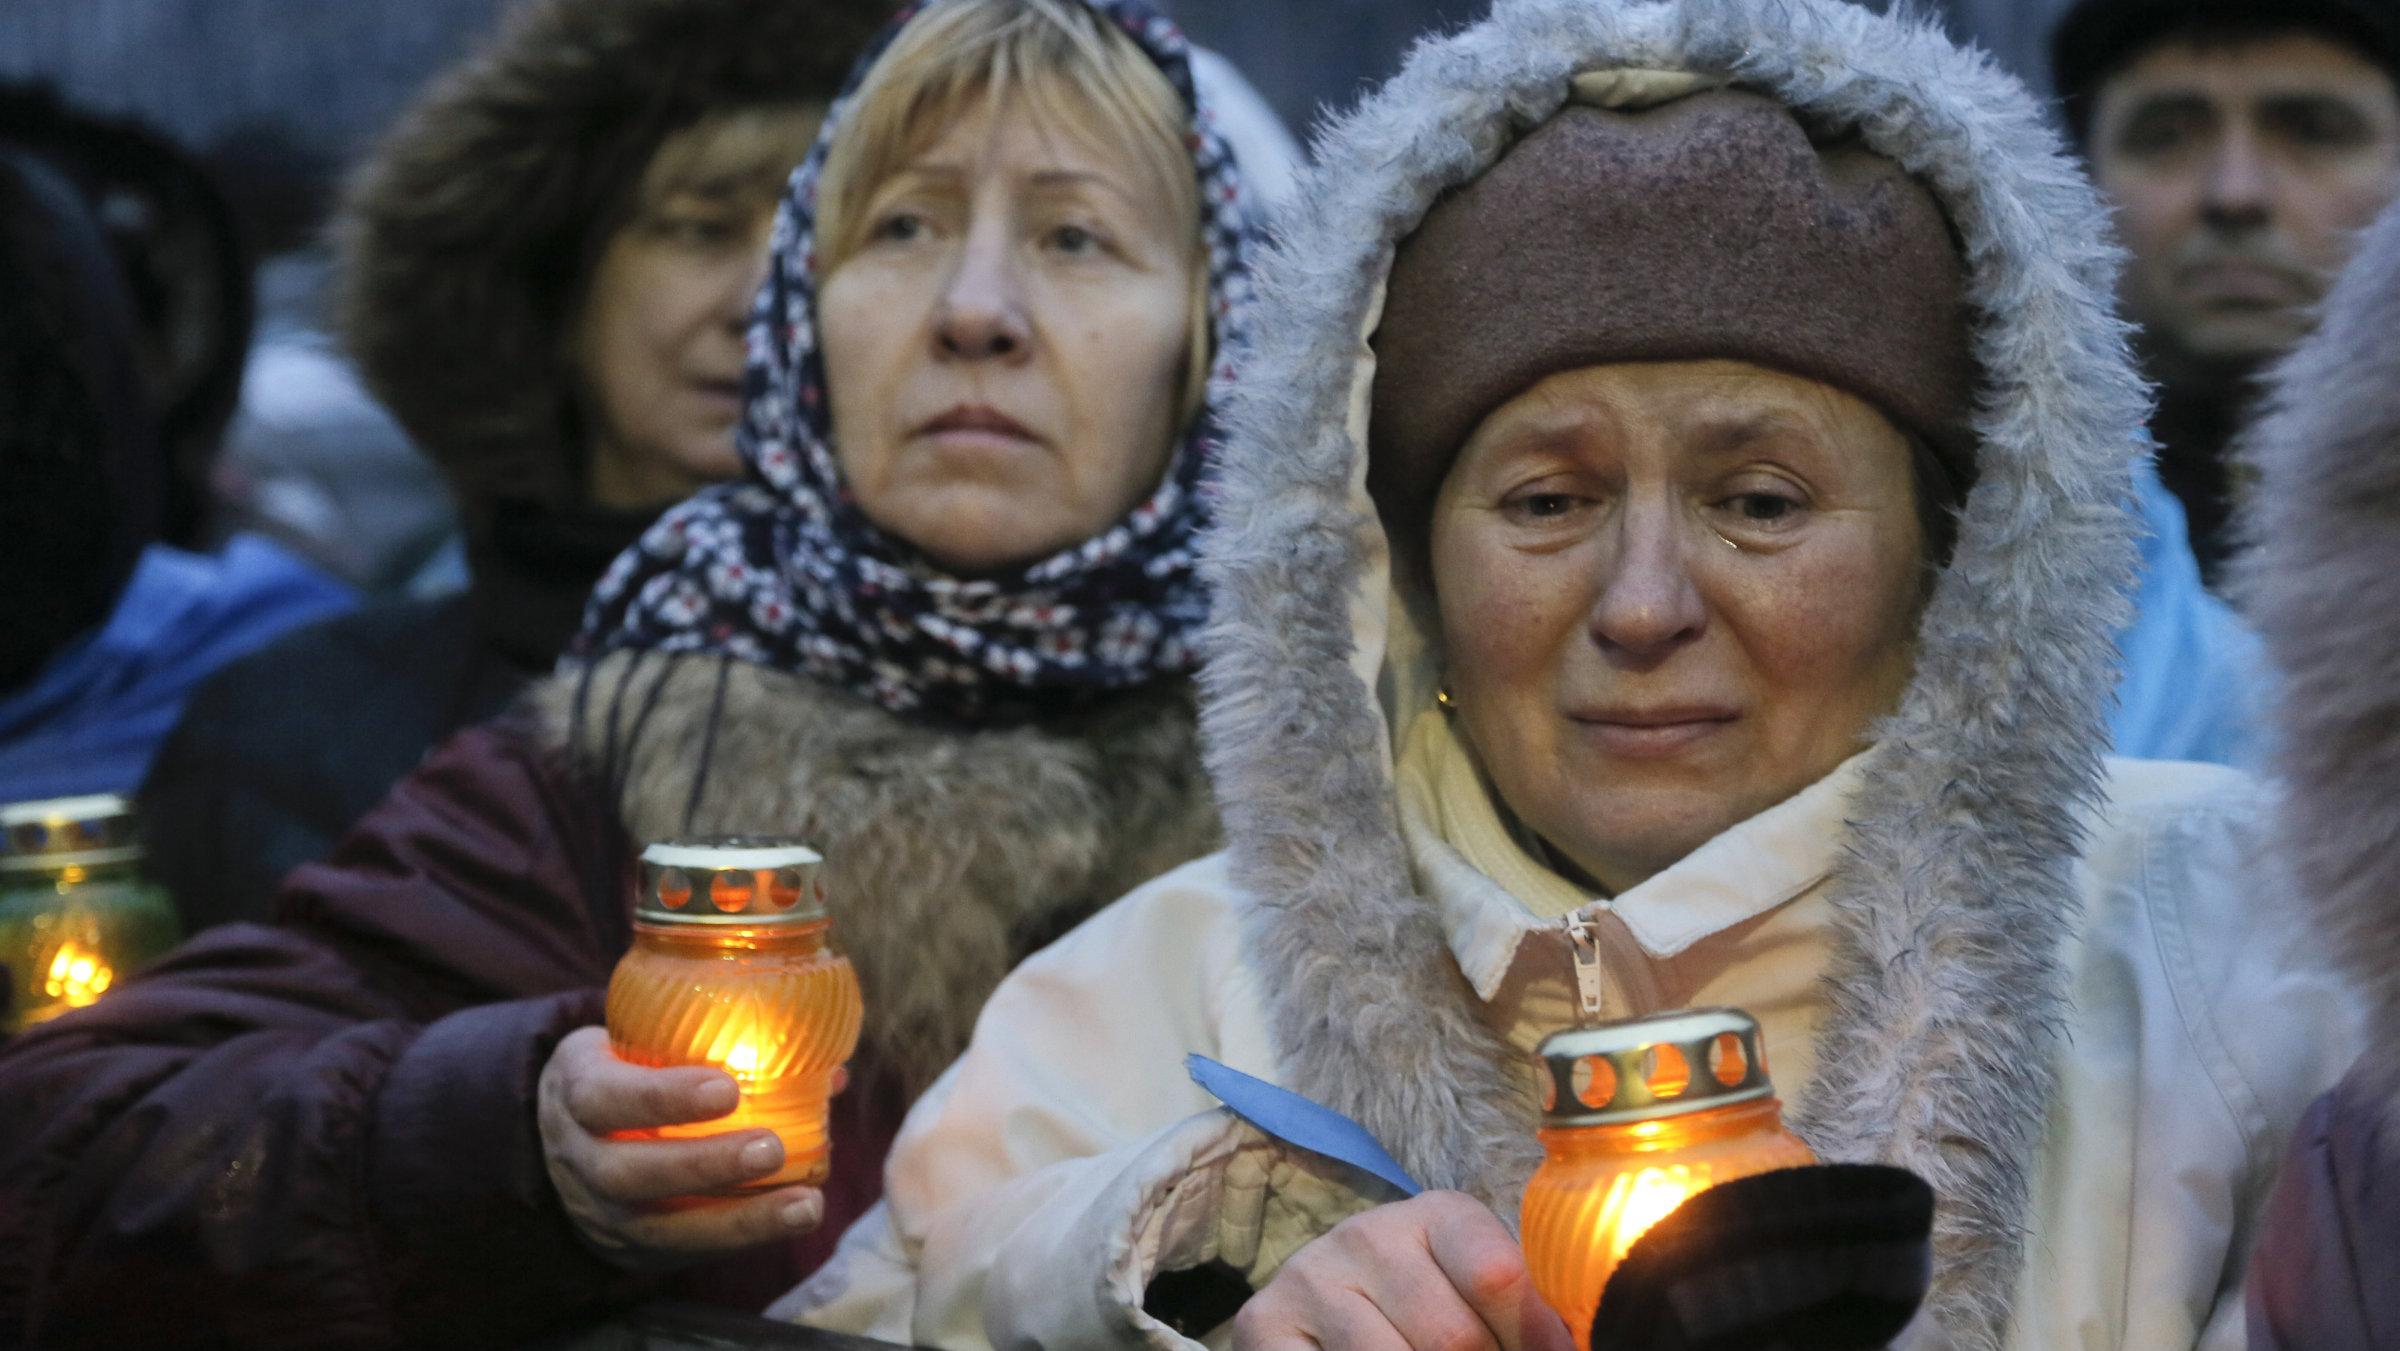 ukraine protestors at vigil